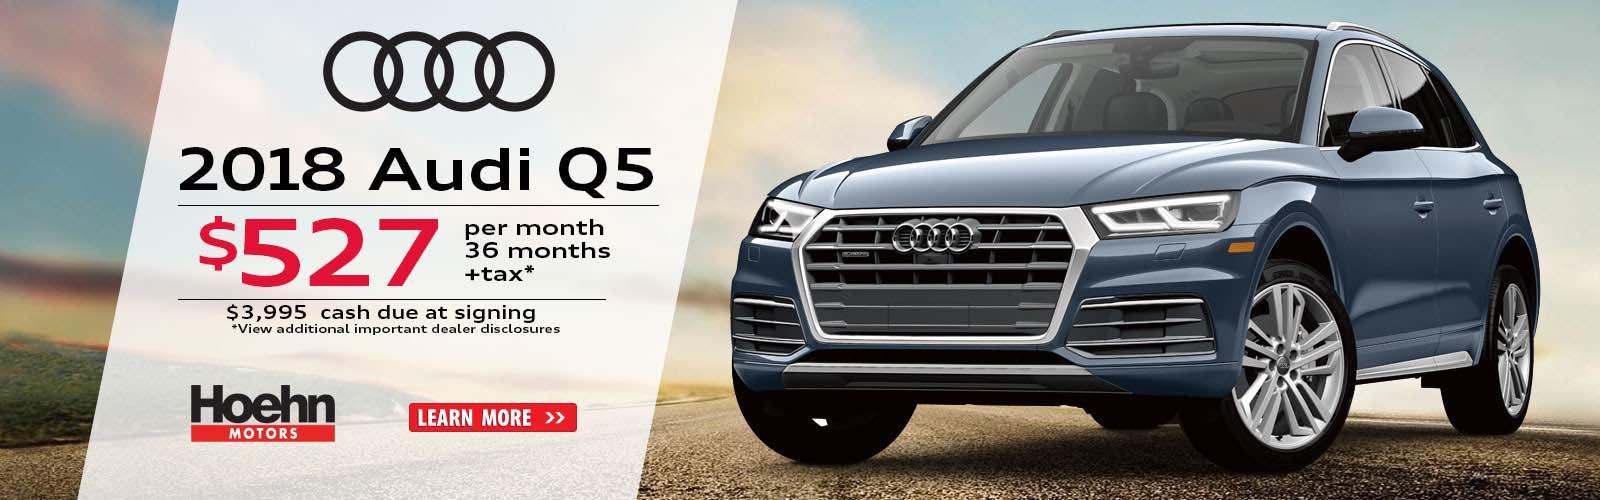 Audi Carlsbad A Hoehn Motors Company New Audi Dealership In - Socal audi dealers